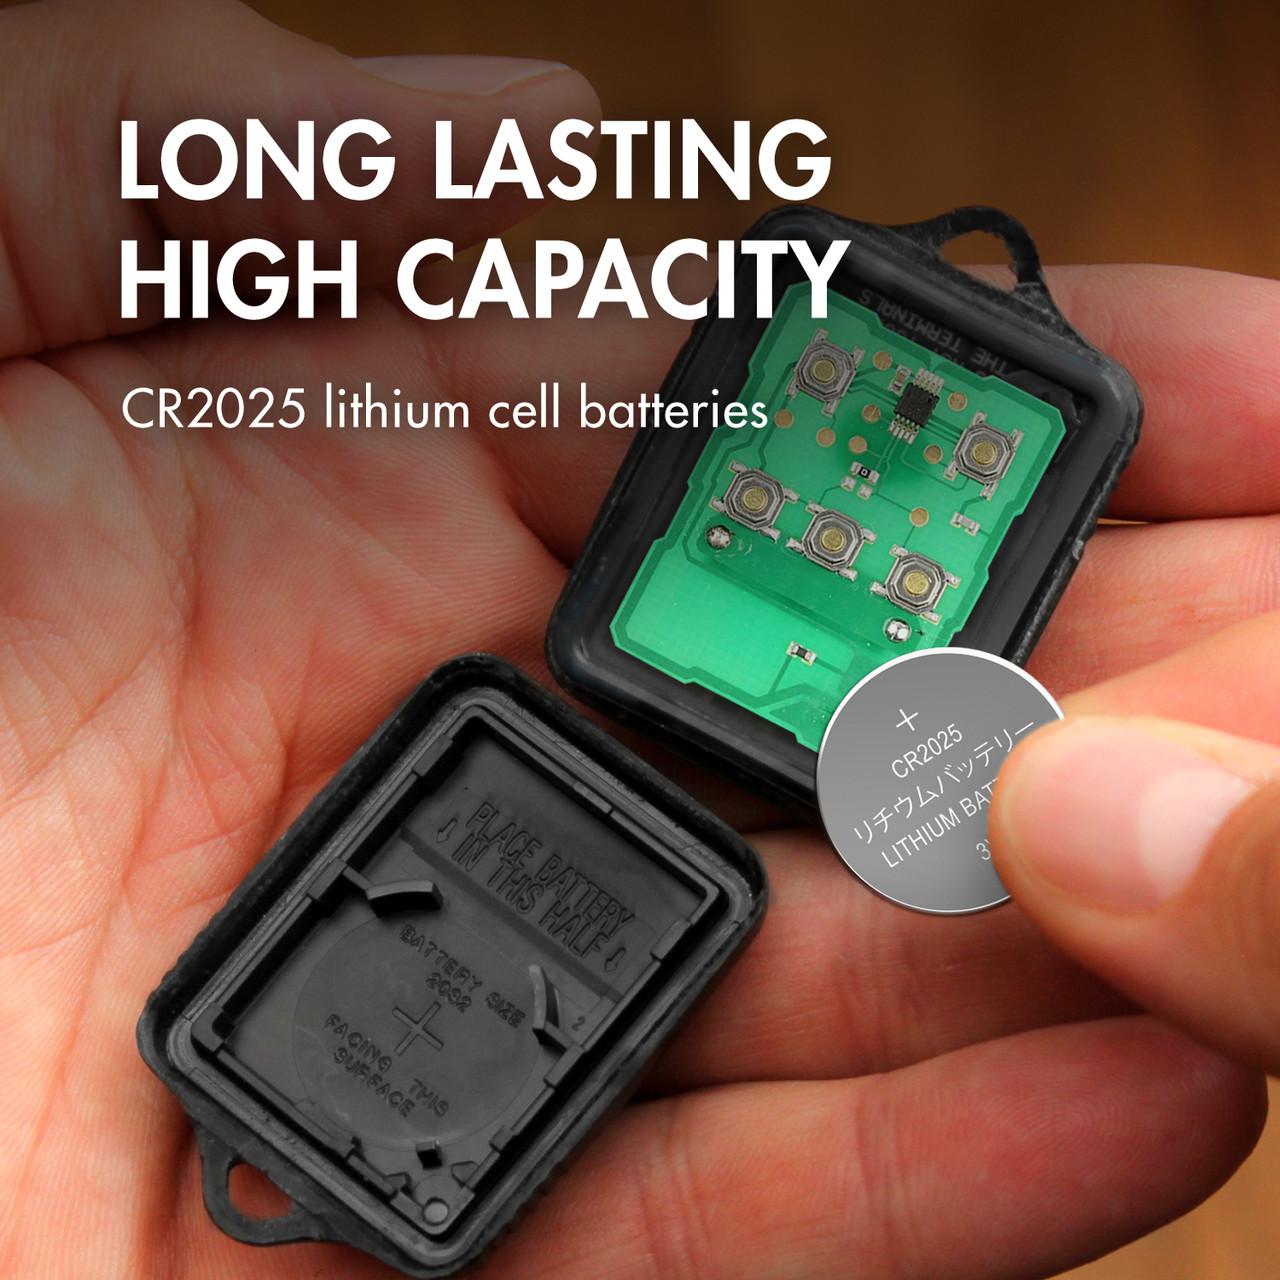 1 Card: 5pcs Tenergy CR2025 Lithium Button Cells